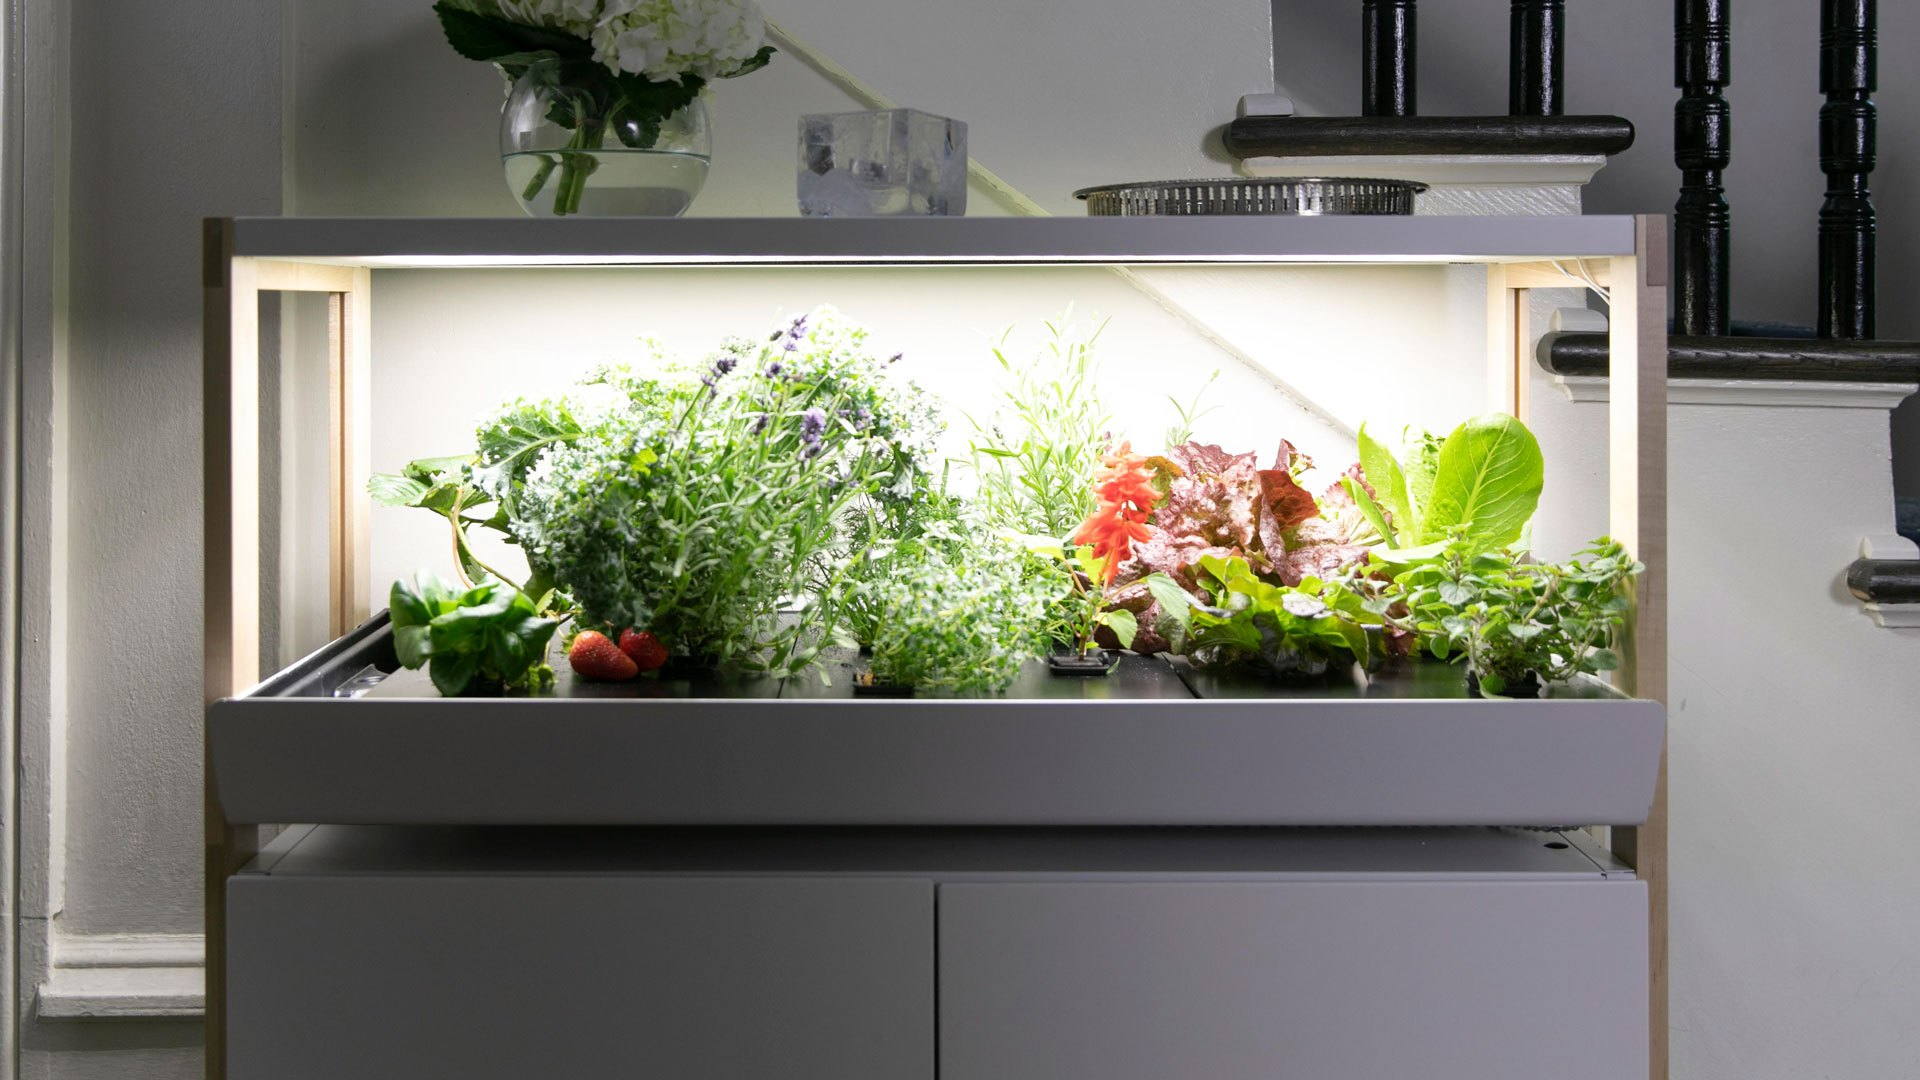 Factors to consider while beginning with Indoor Gardening